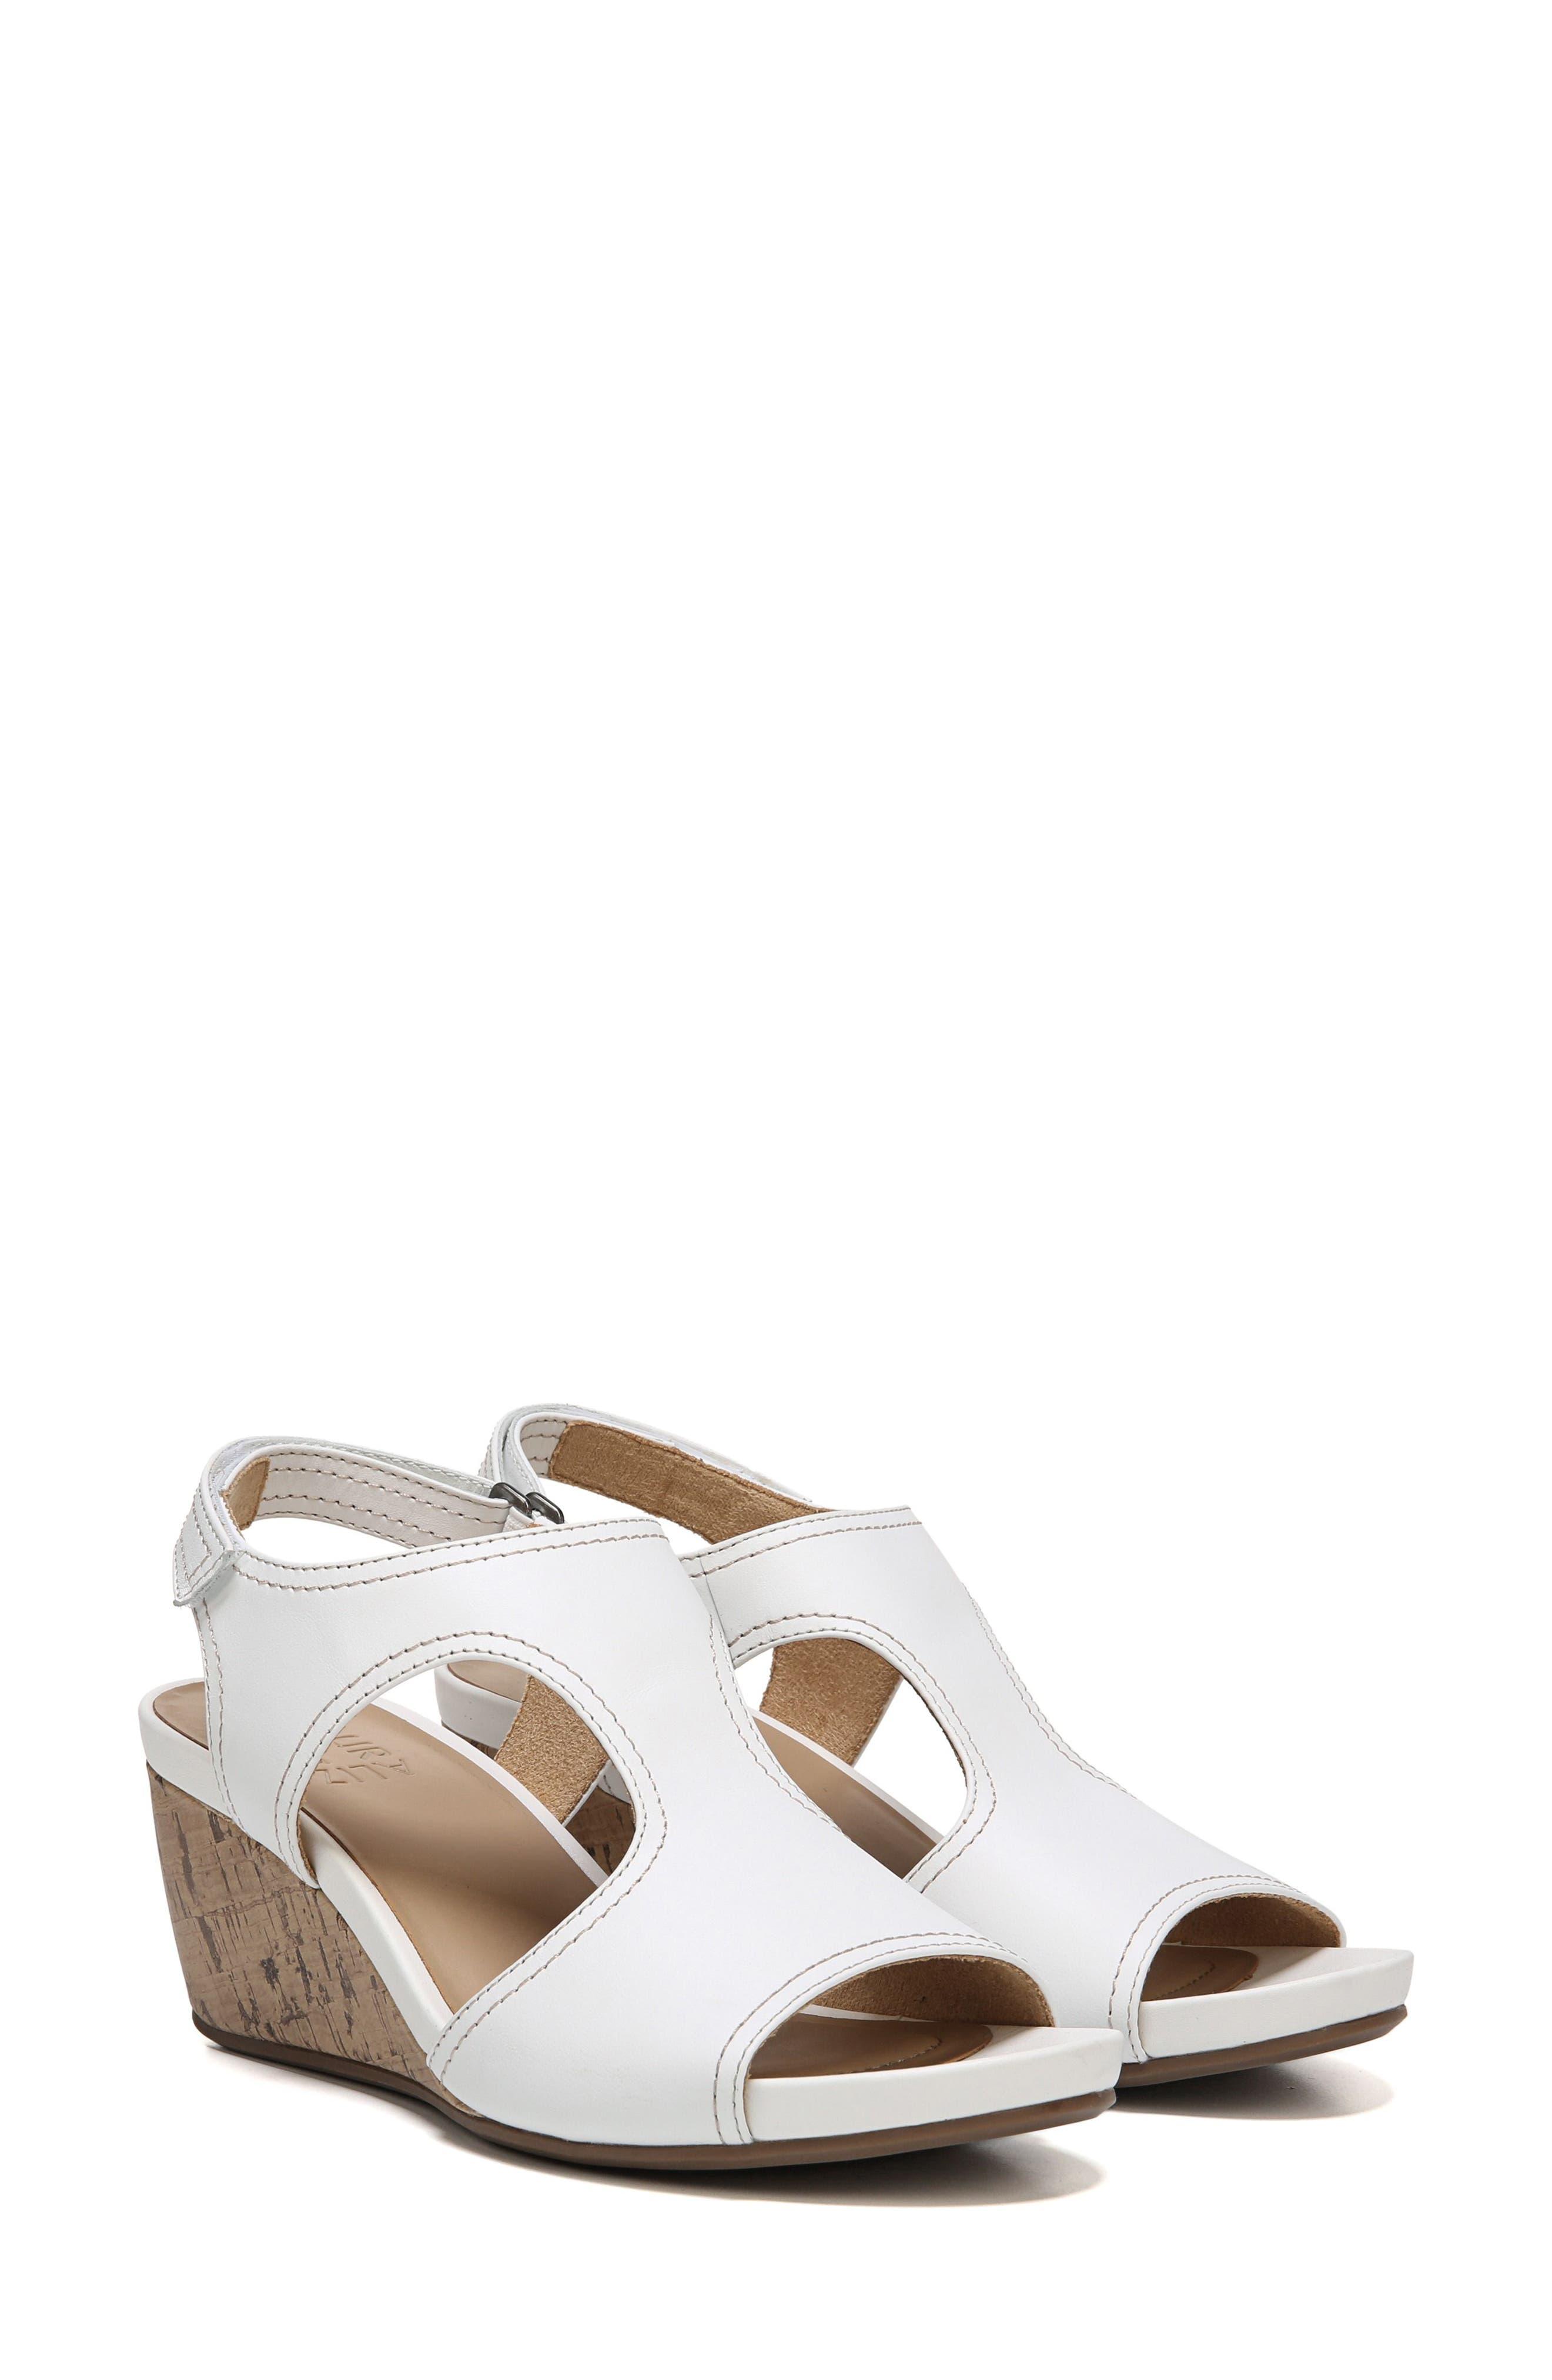 Cinda Wedge Sandal,                             Alternate thumbnail 7, color,                             White Leather